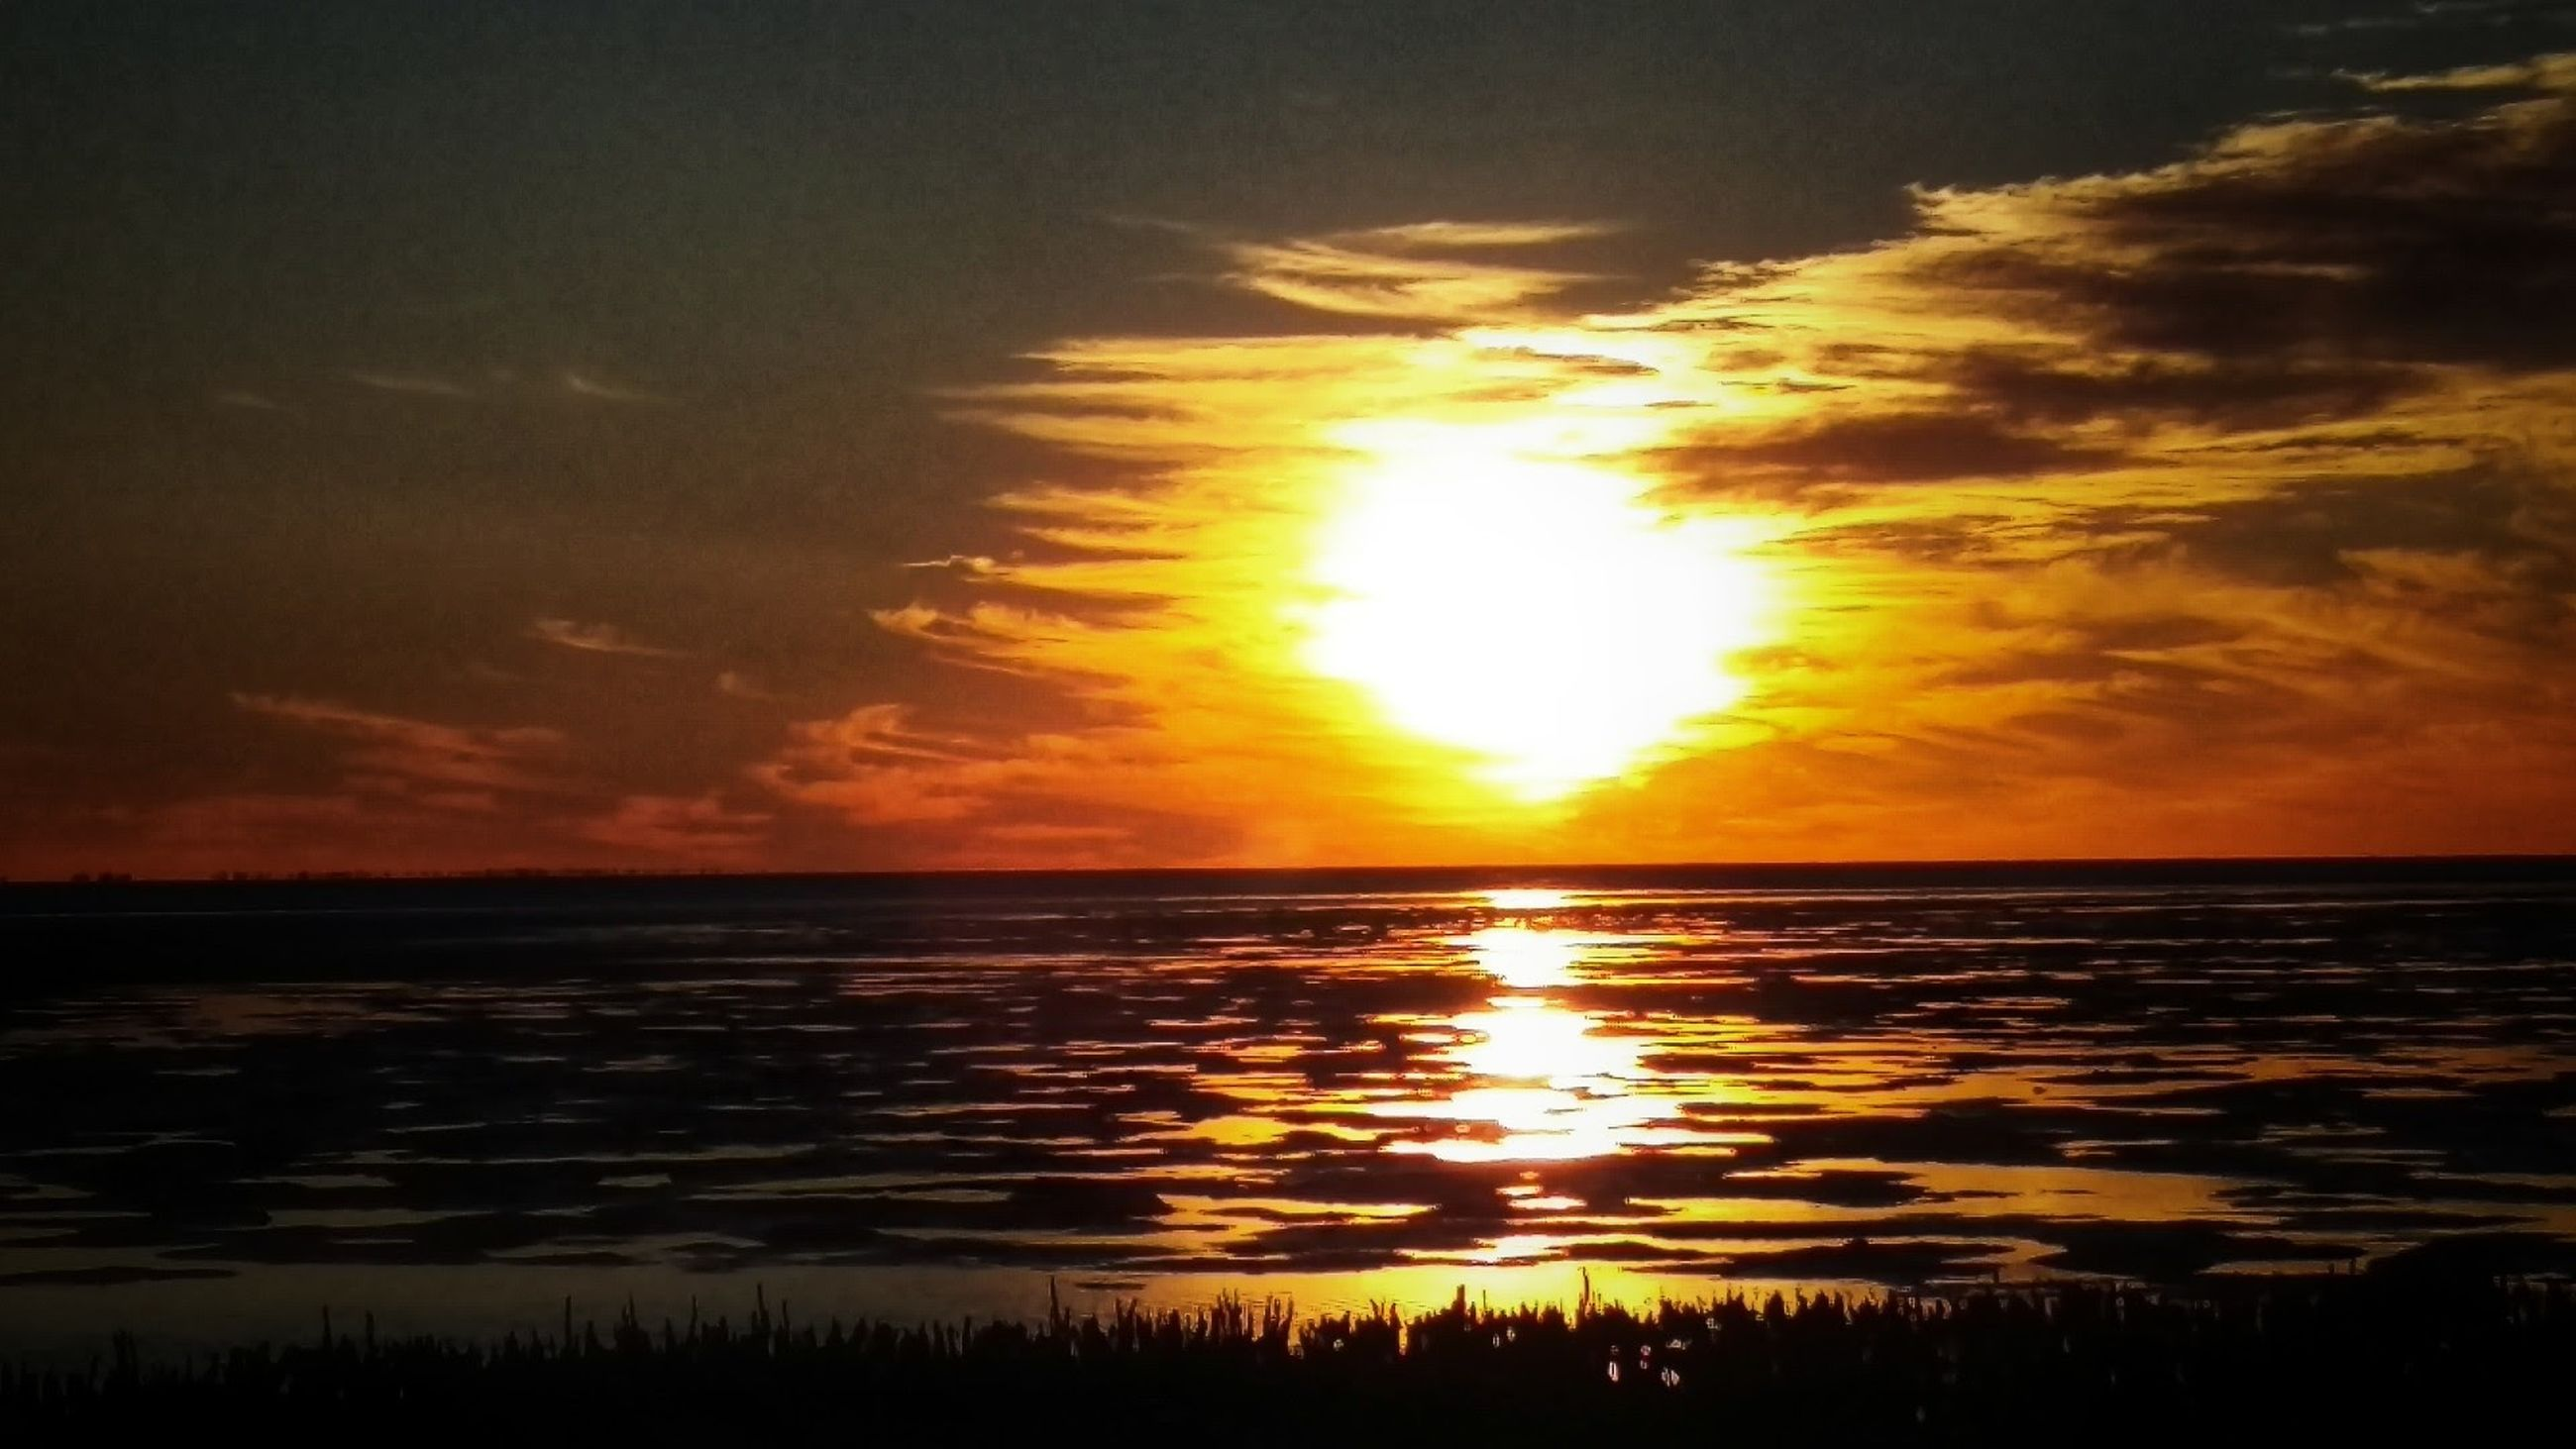 sky, sunset, water, scenics - nature, cloud - sky, beauty in nature, sea, tranquil scene, tranquility, horizon, horizon over water, sun, nature, idyllic, orange color, sunlight, beach, no people, land, outdoors